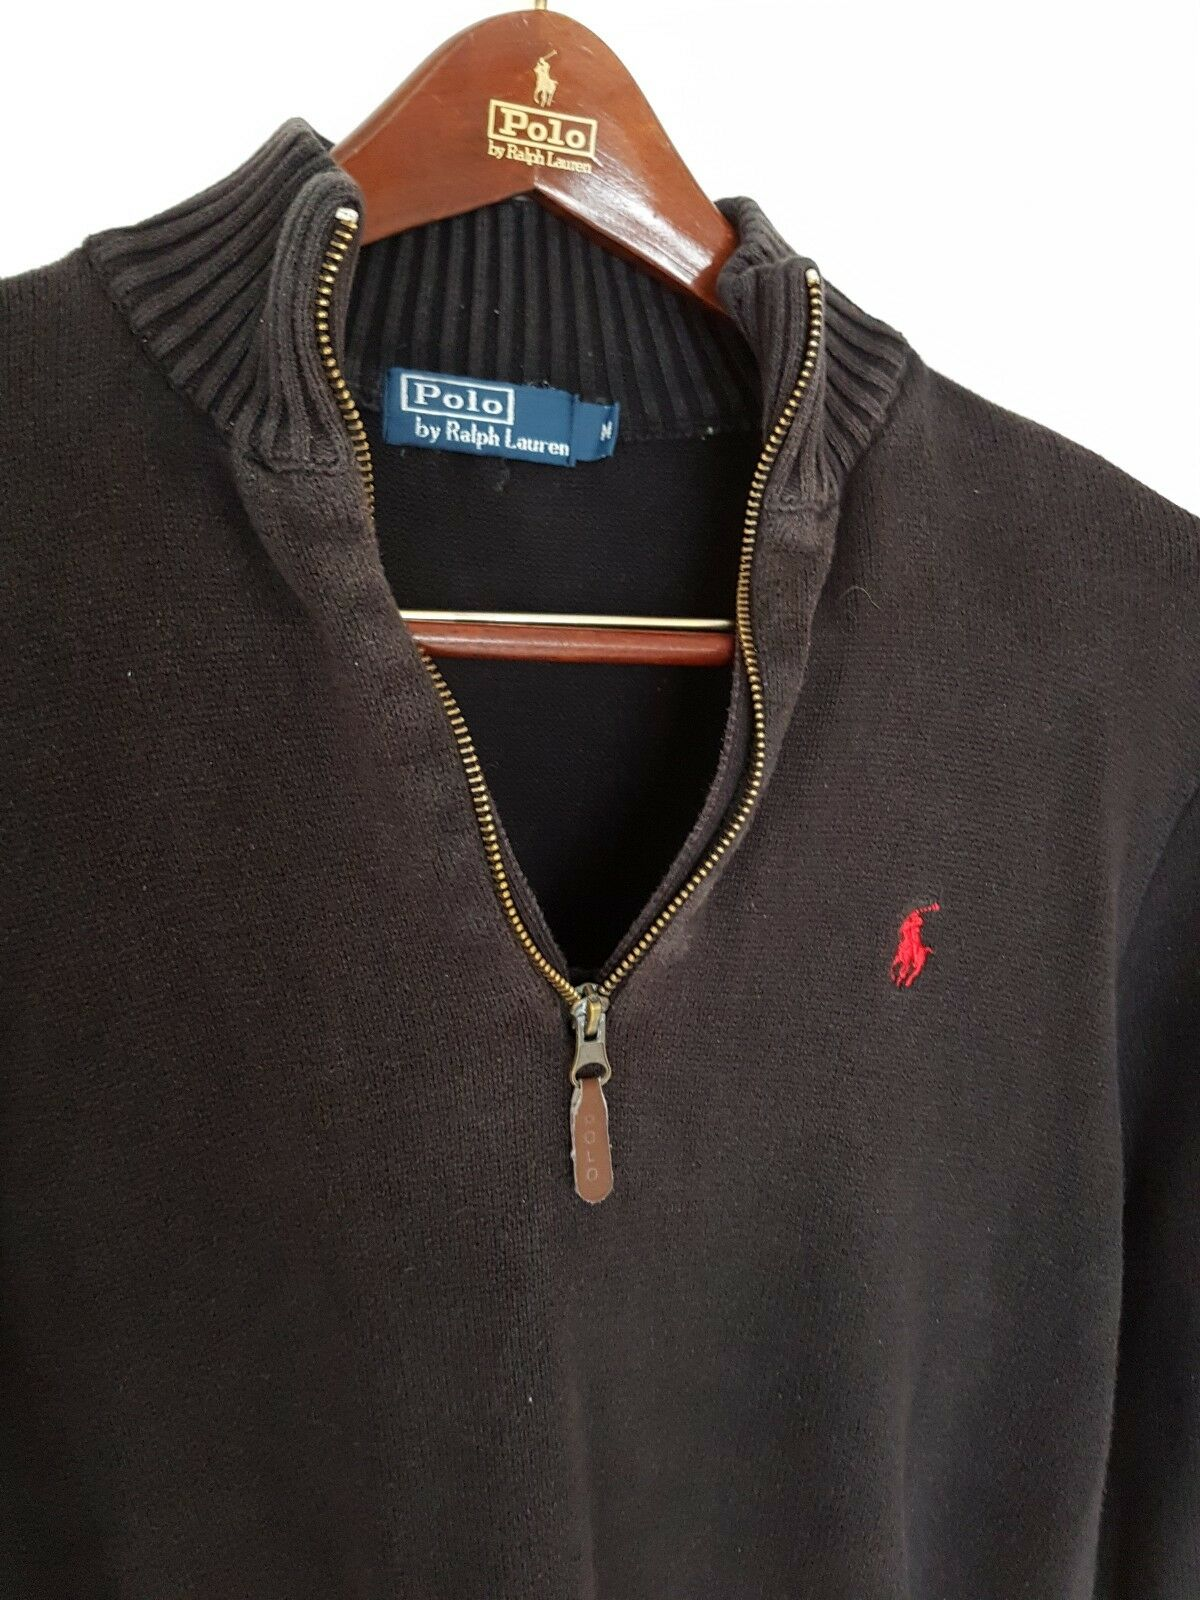 Mens POLO by RALPH LAUREN 1 4 Zip Jumper Sweater Größe medium large.